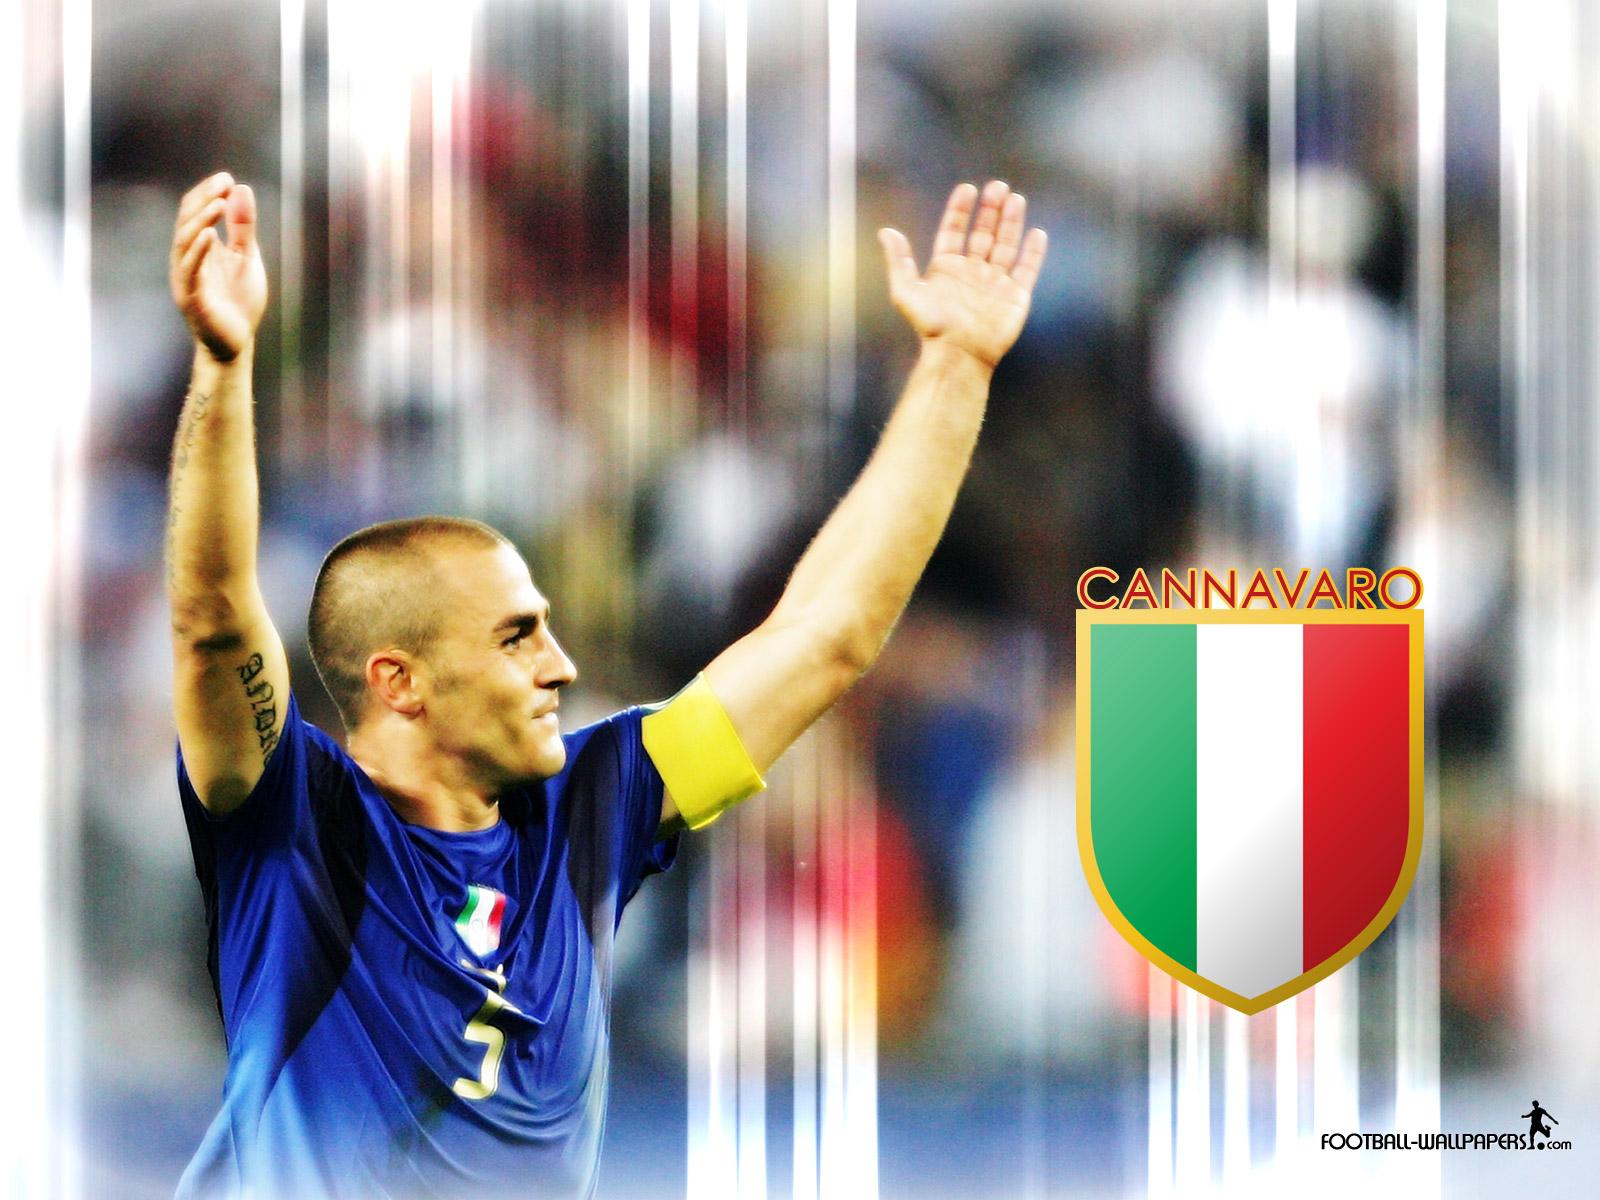 http://1.bp.blogspot.com/_sz0cYw8eOxY/TGJwTZcTJDI/AAAAAAAACes/8pWFo_v_B5g/s1600/Fabio_Cannavaro.jpg